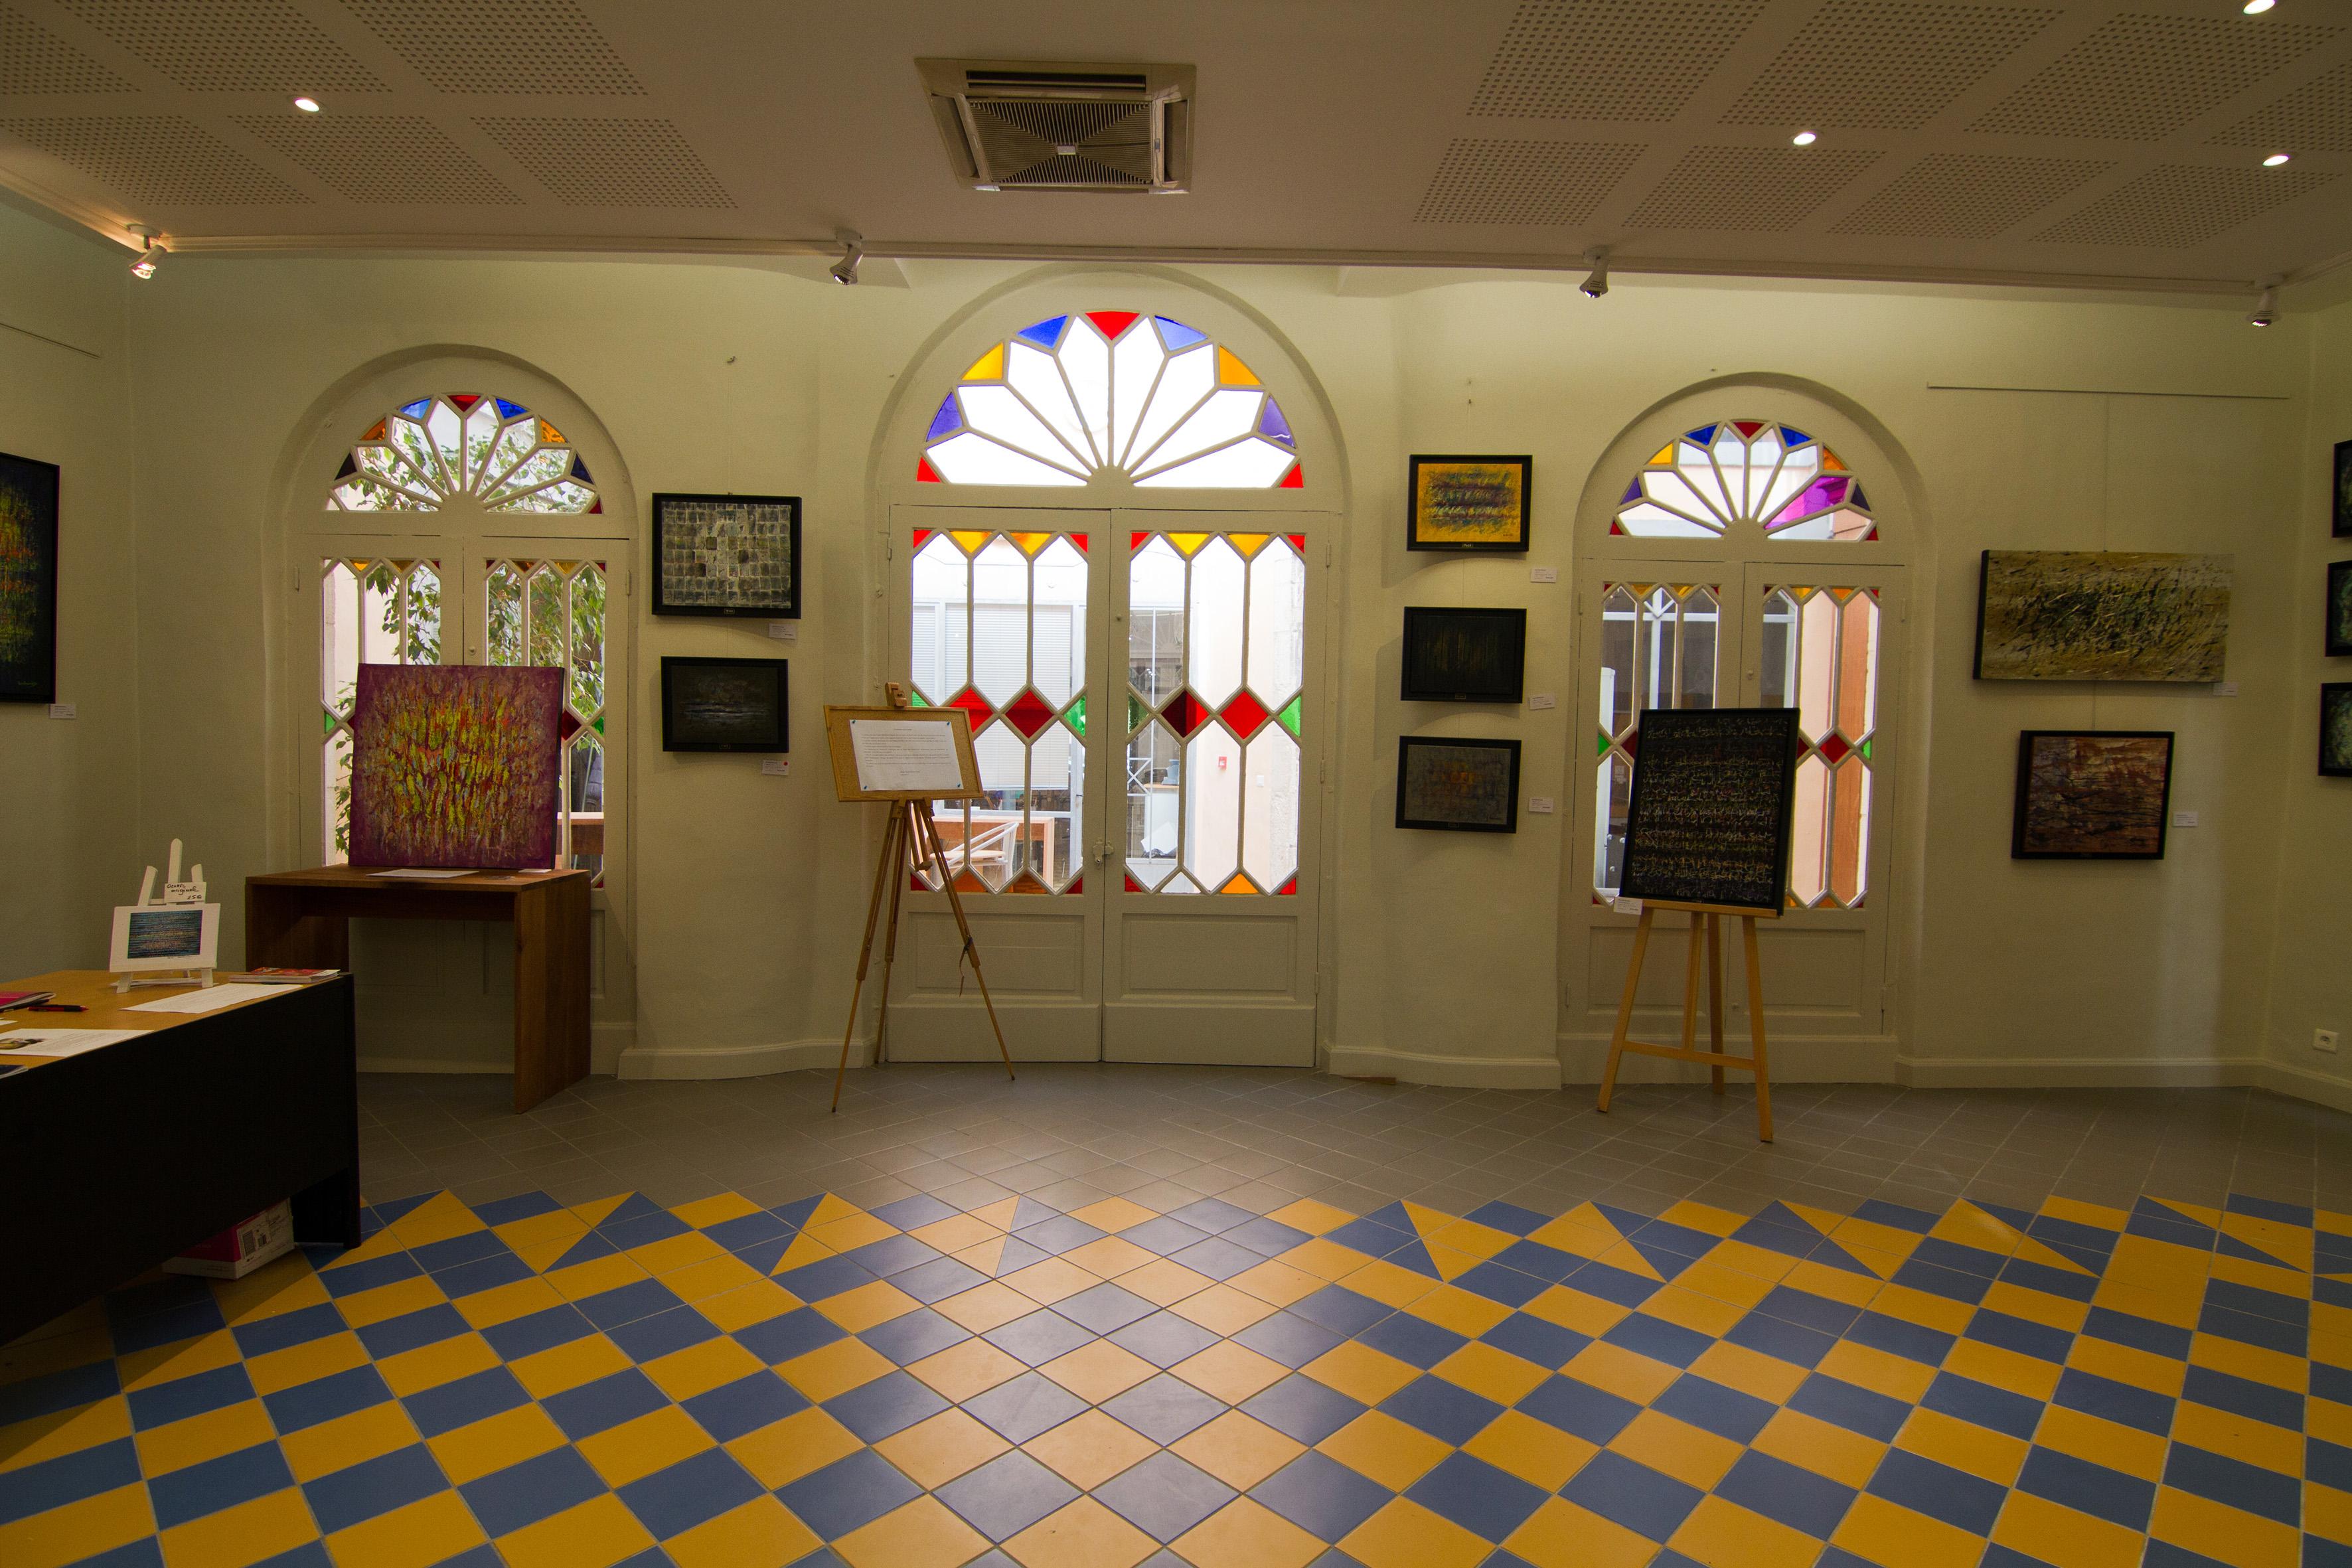 Galerie d'Art l'Arcade Saint-Clar_Jean-Claude Bertrand-5908-170707